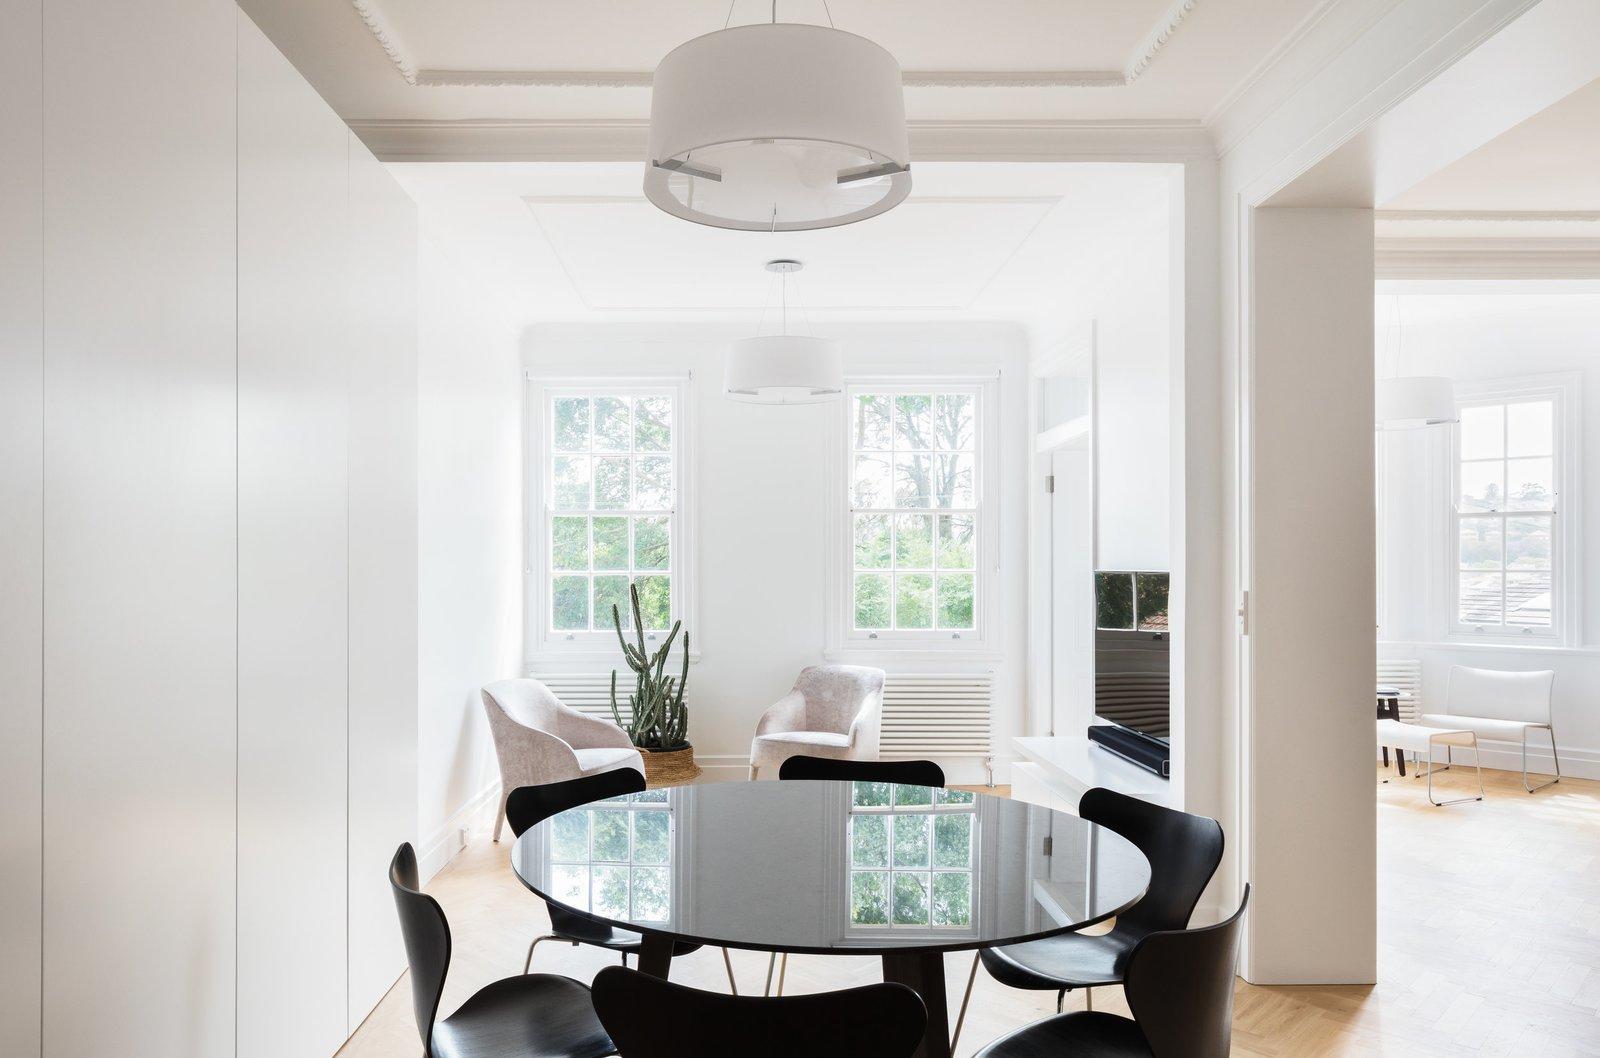 Dining Room, Chair, Pendant Lighting, Table, and Light Hardwood Floor  K Apartment